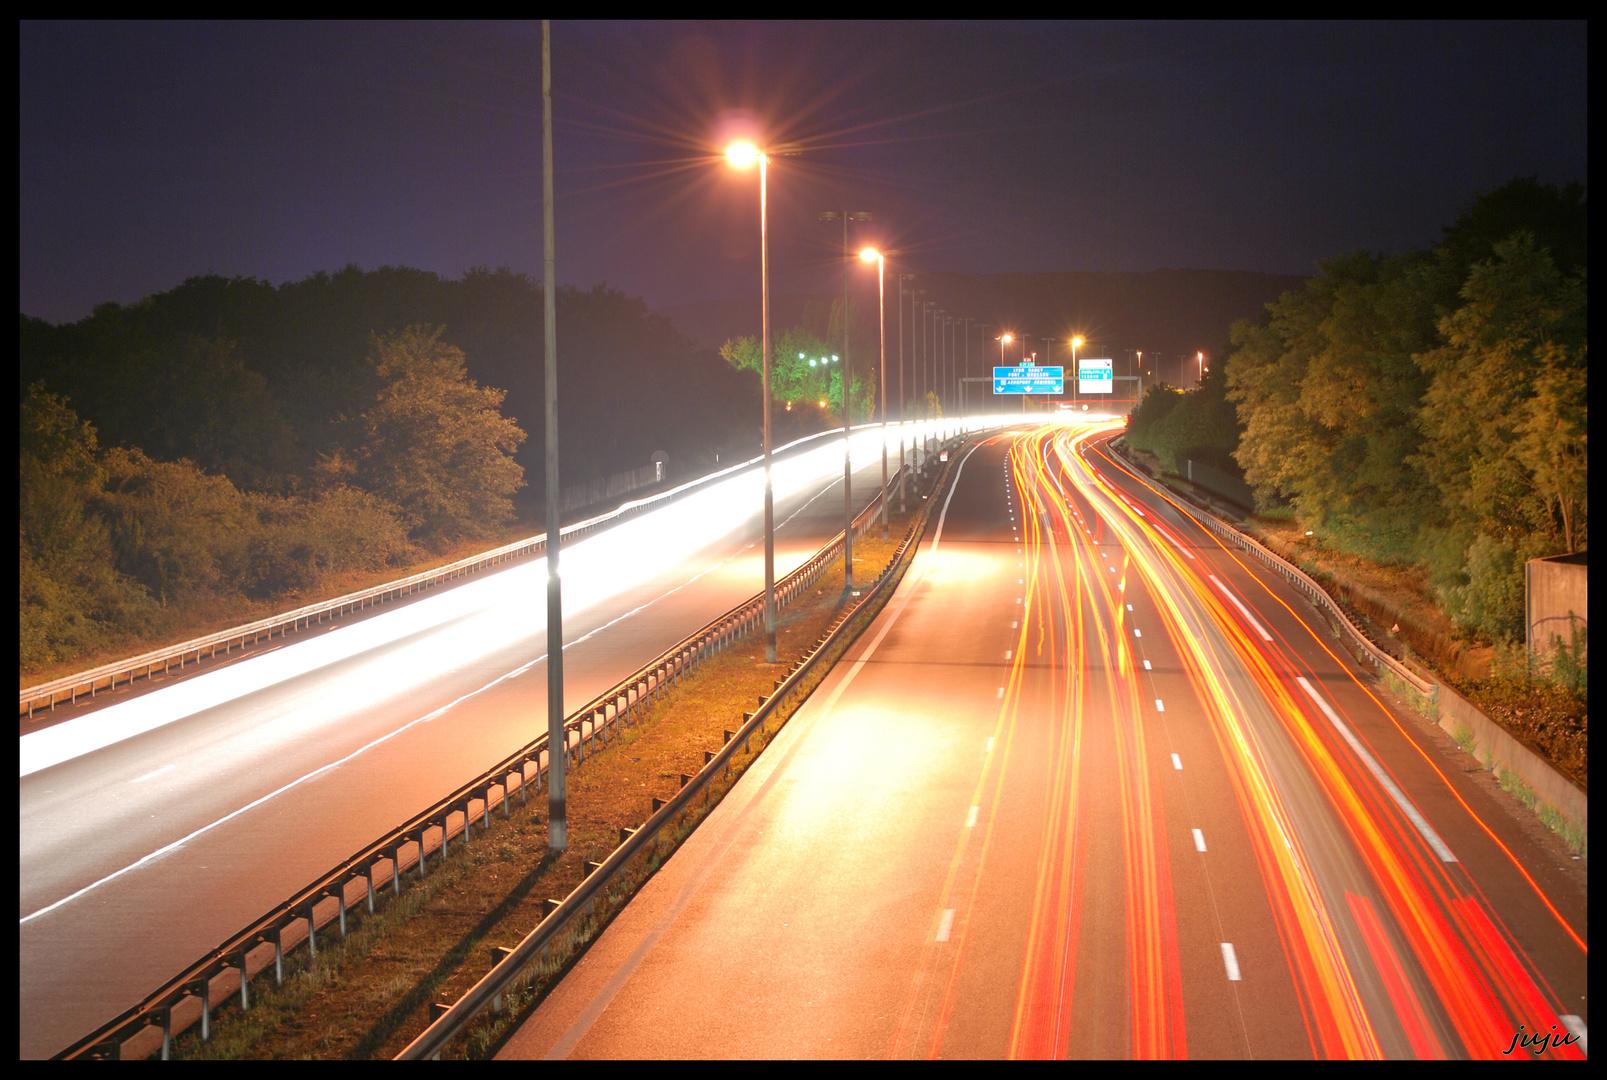 A31 by night